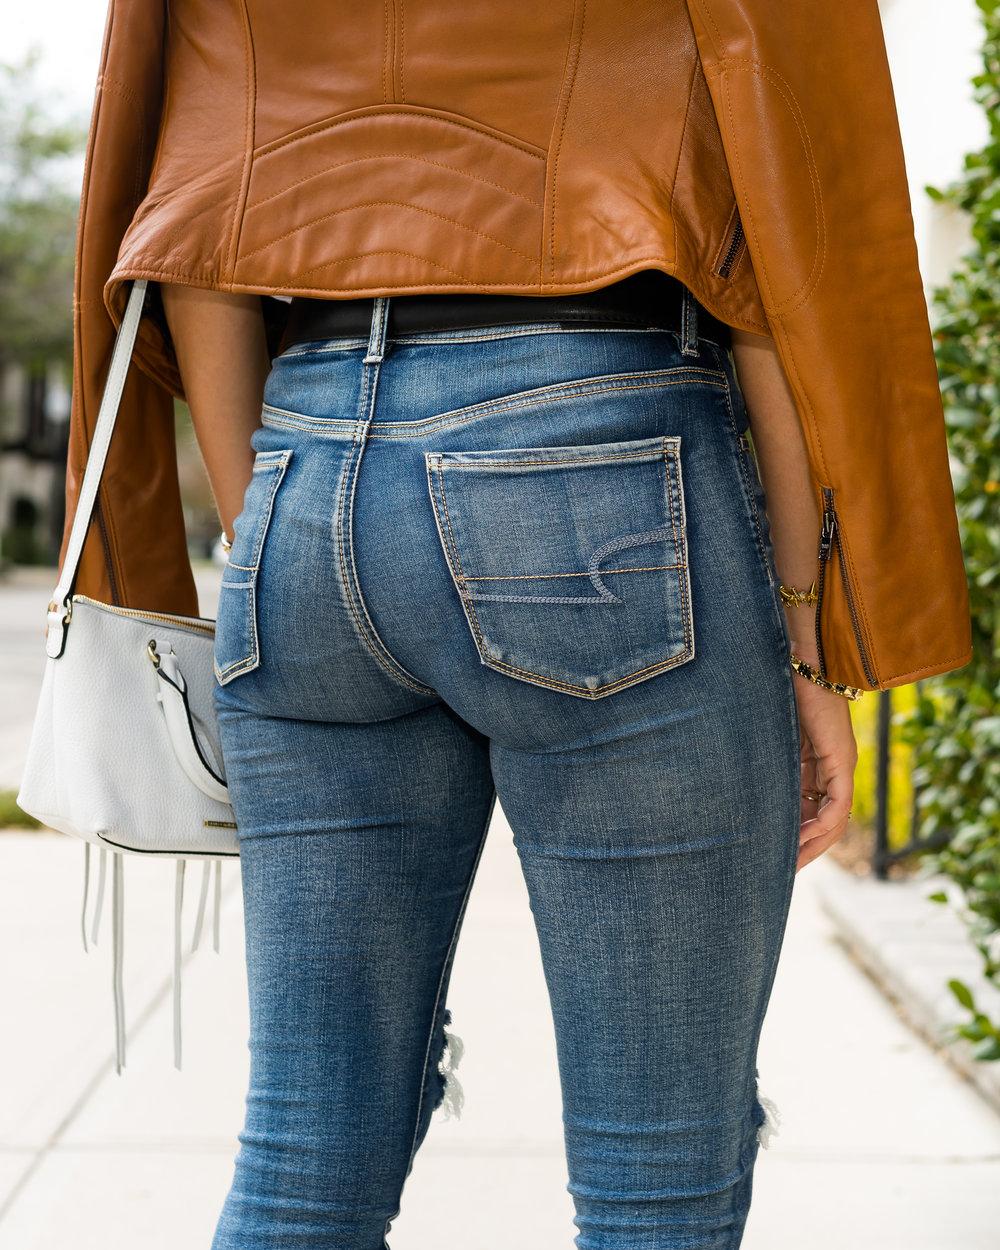 American Eagle high waist jeans